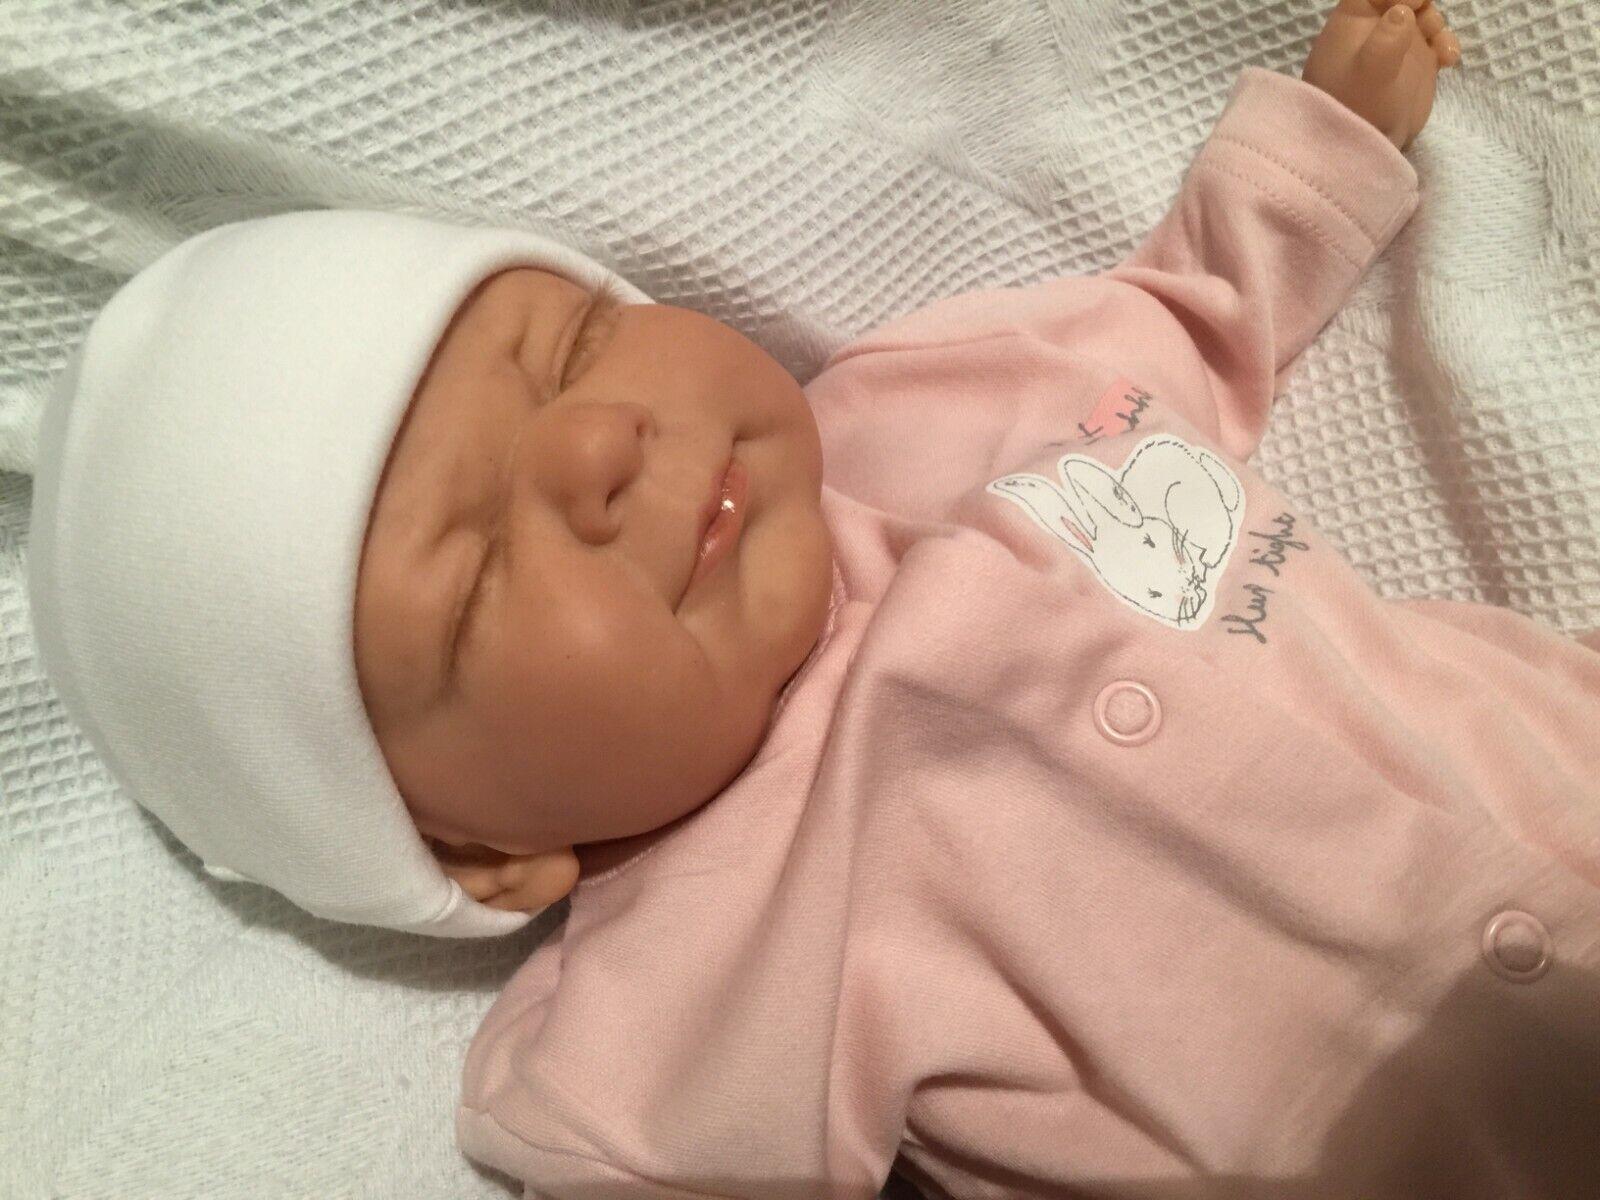 Cheeky Girl Reborn Handmade Realistic Doll Fake Baby Lifelike UK Seller   GNS